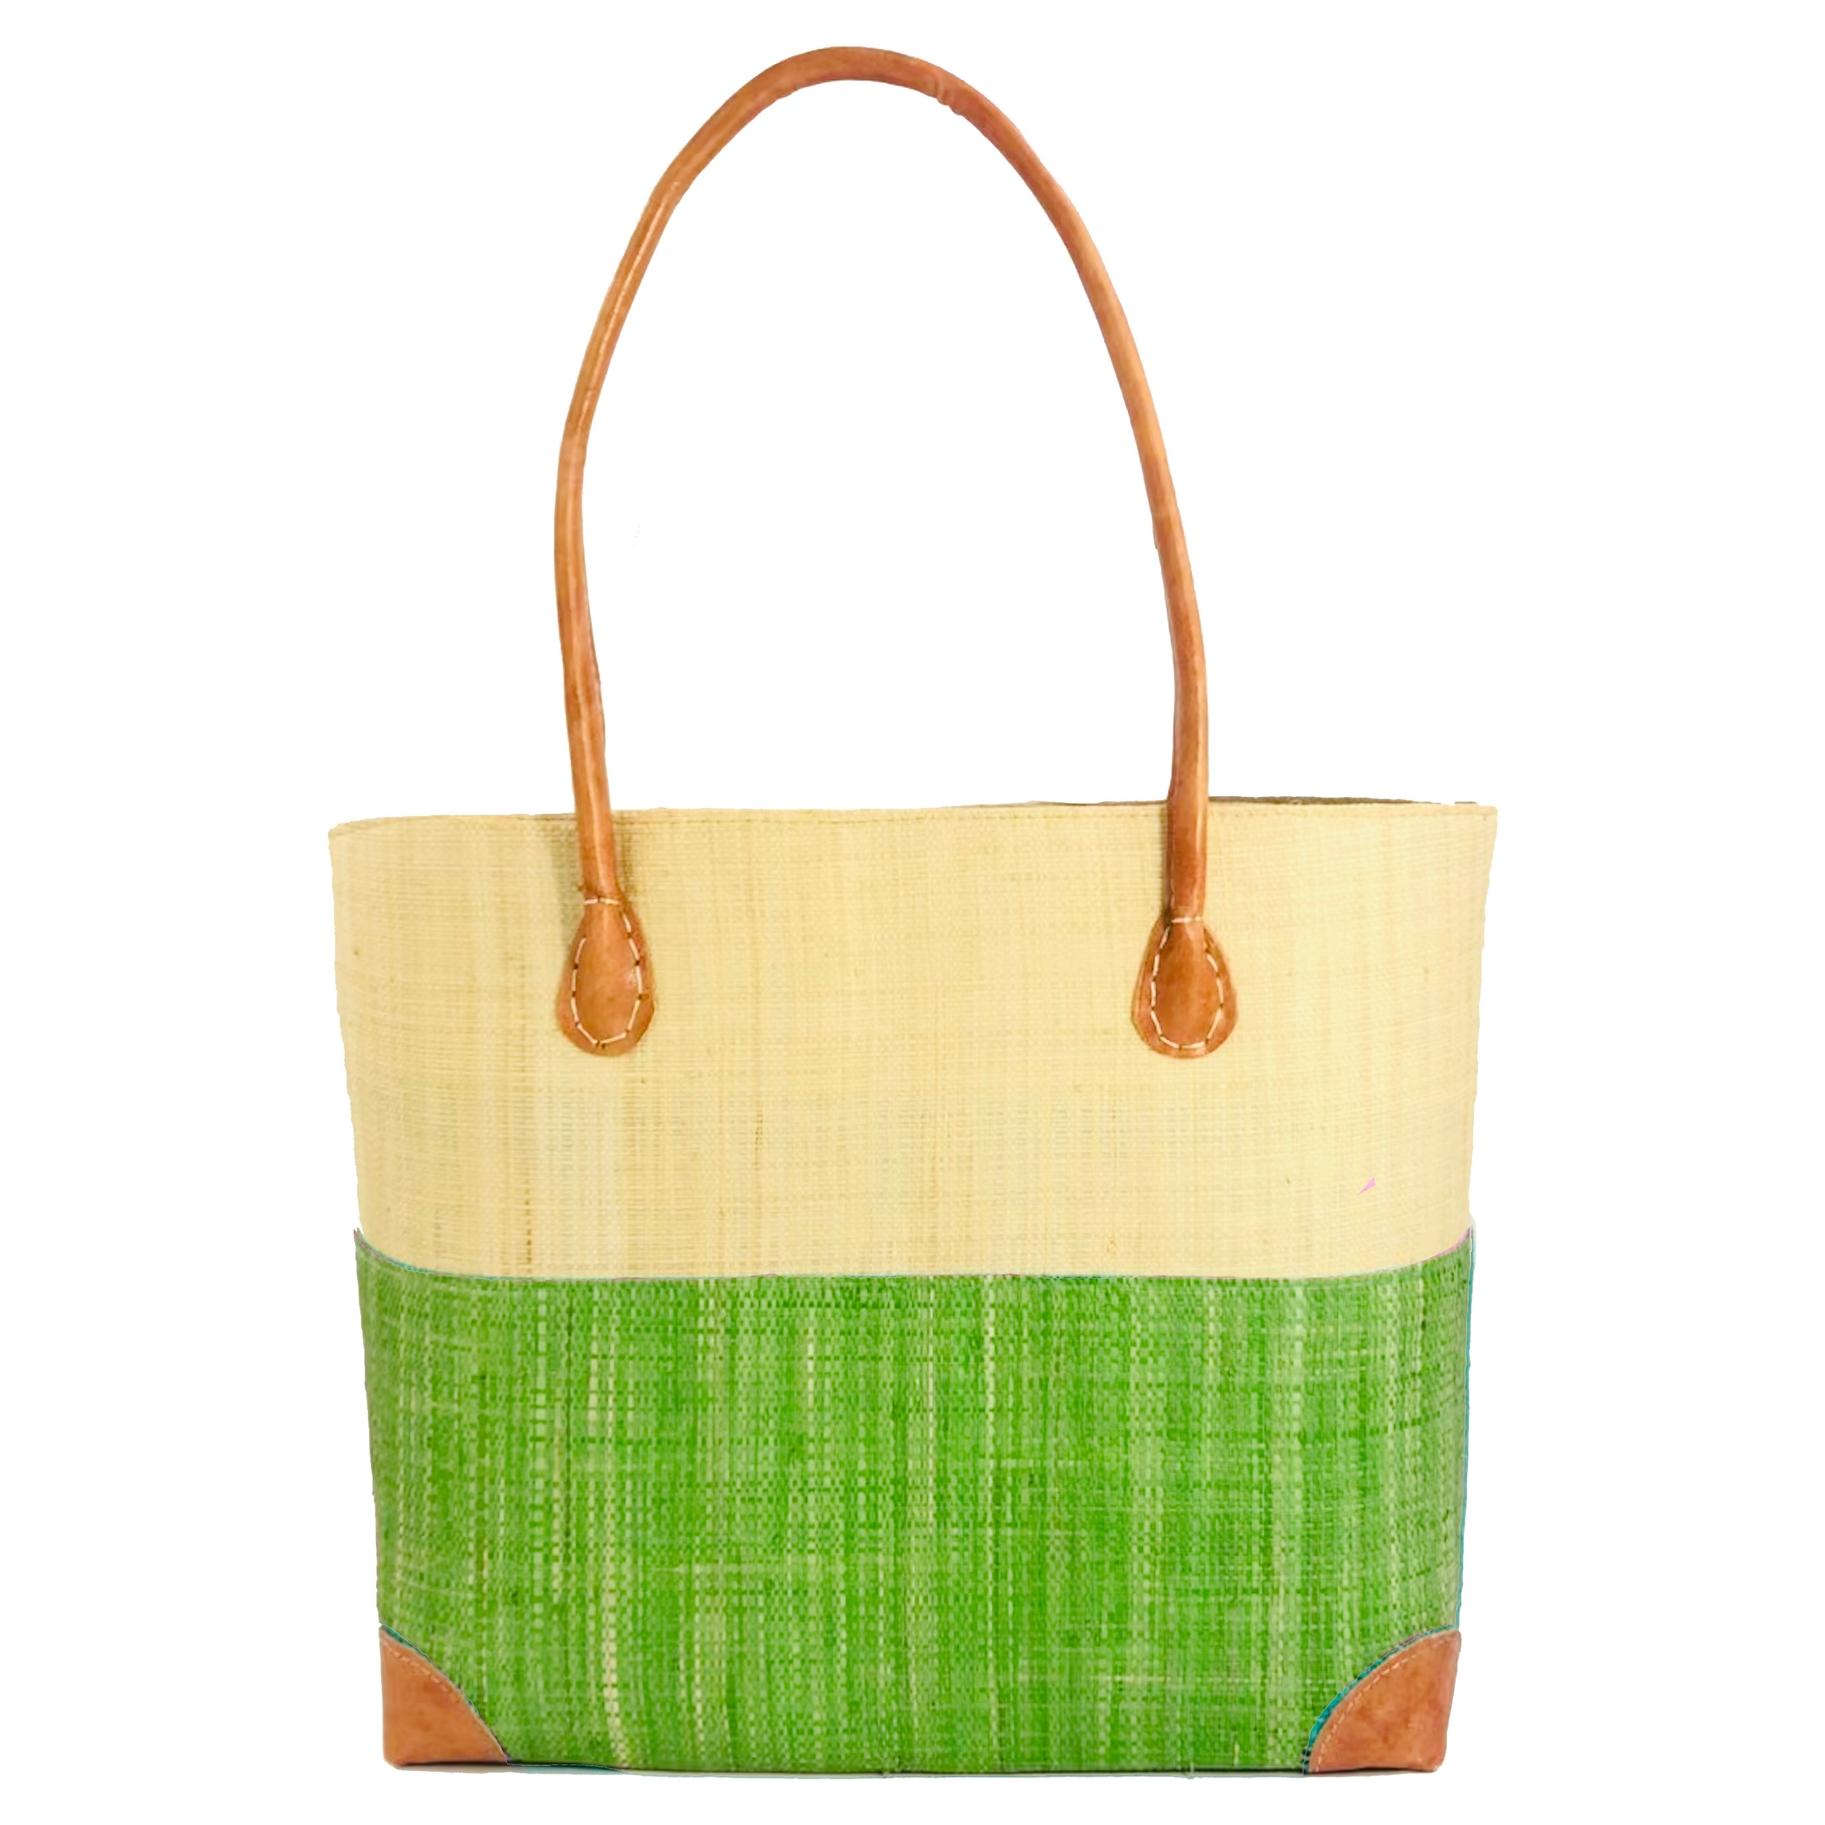 Trinidad Two Tone Straw Basket - Lime | Trada Marketplace